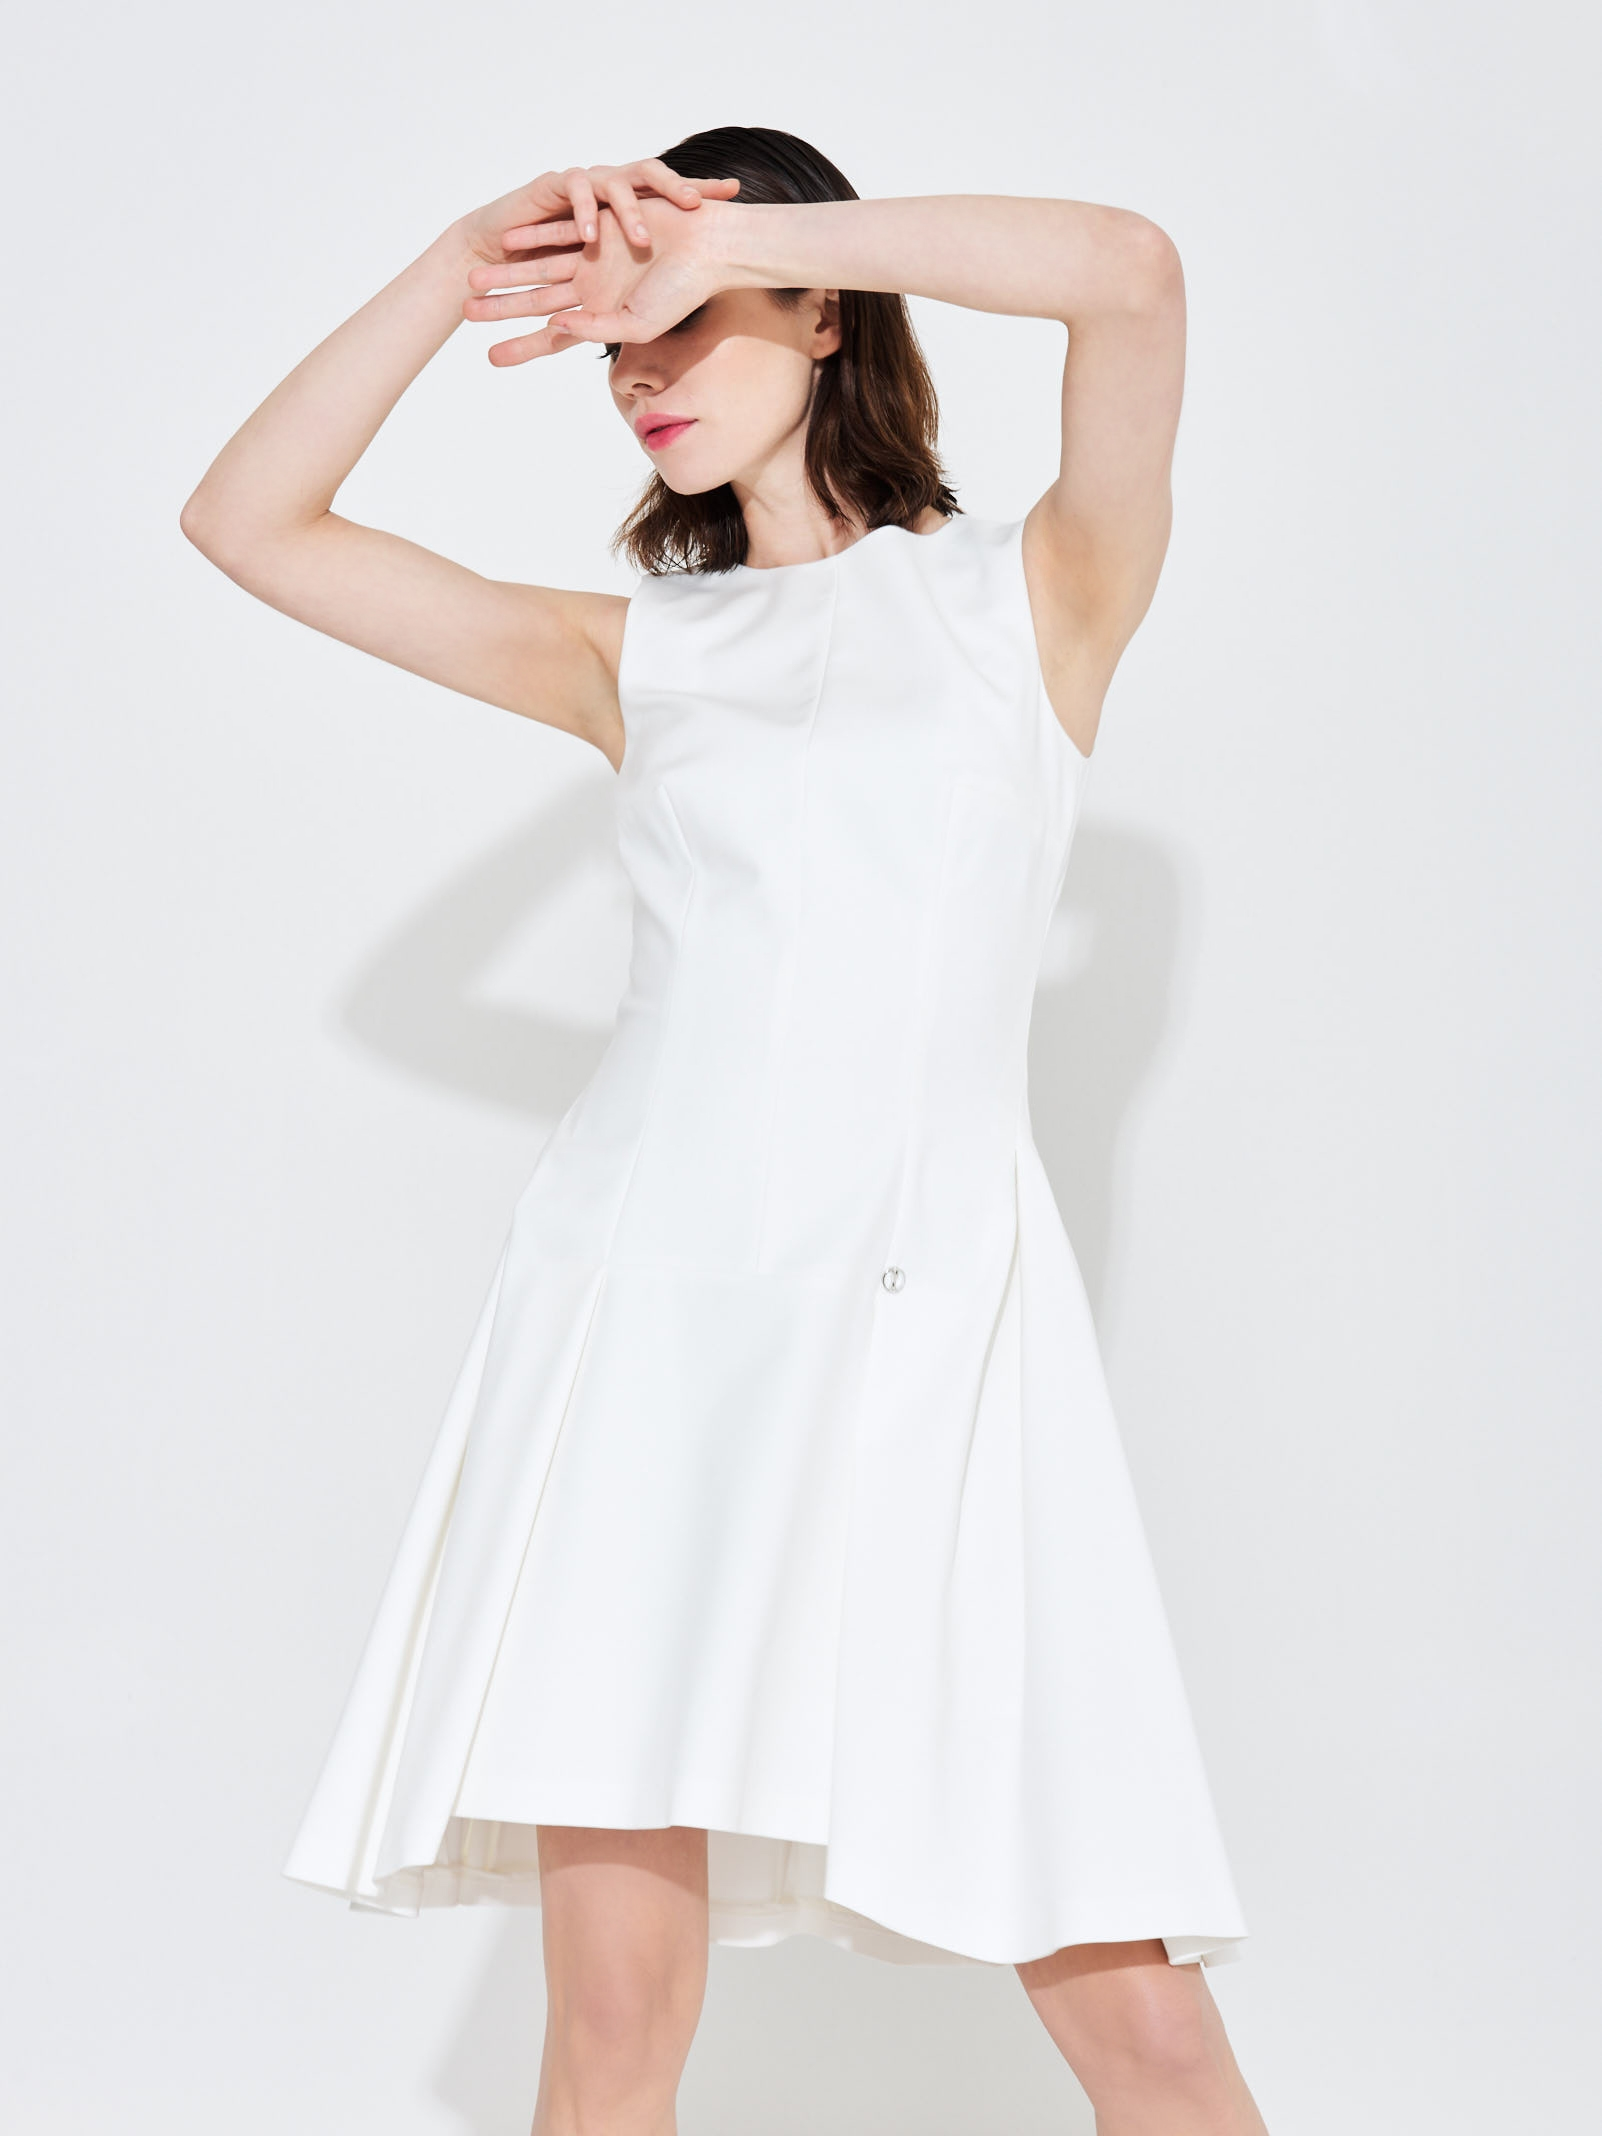 0fbe24fbc8 Sukienka Simple M 38 - 7137640163 - oficjalne archiwum allegro